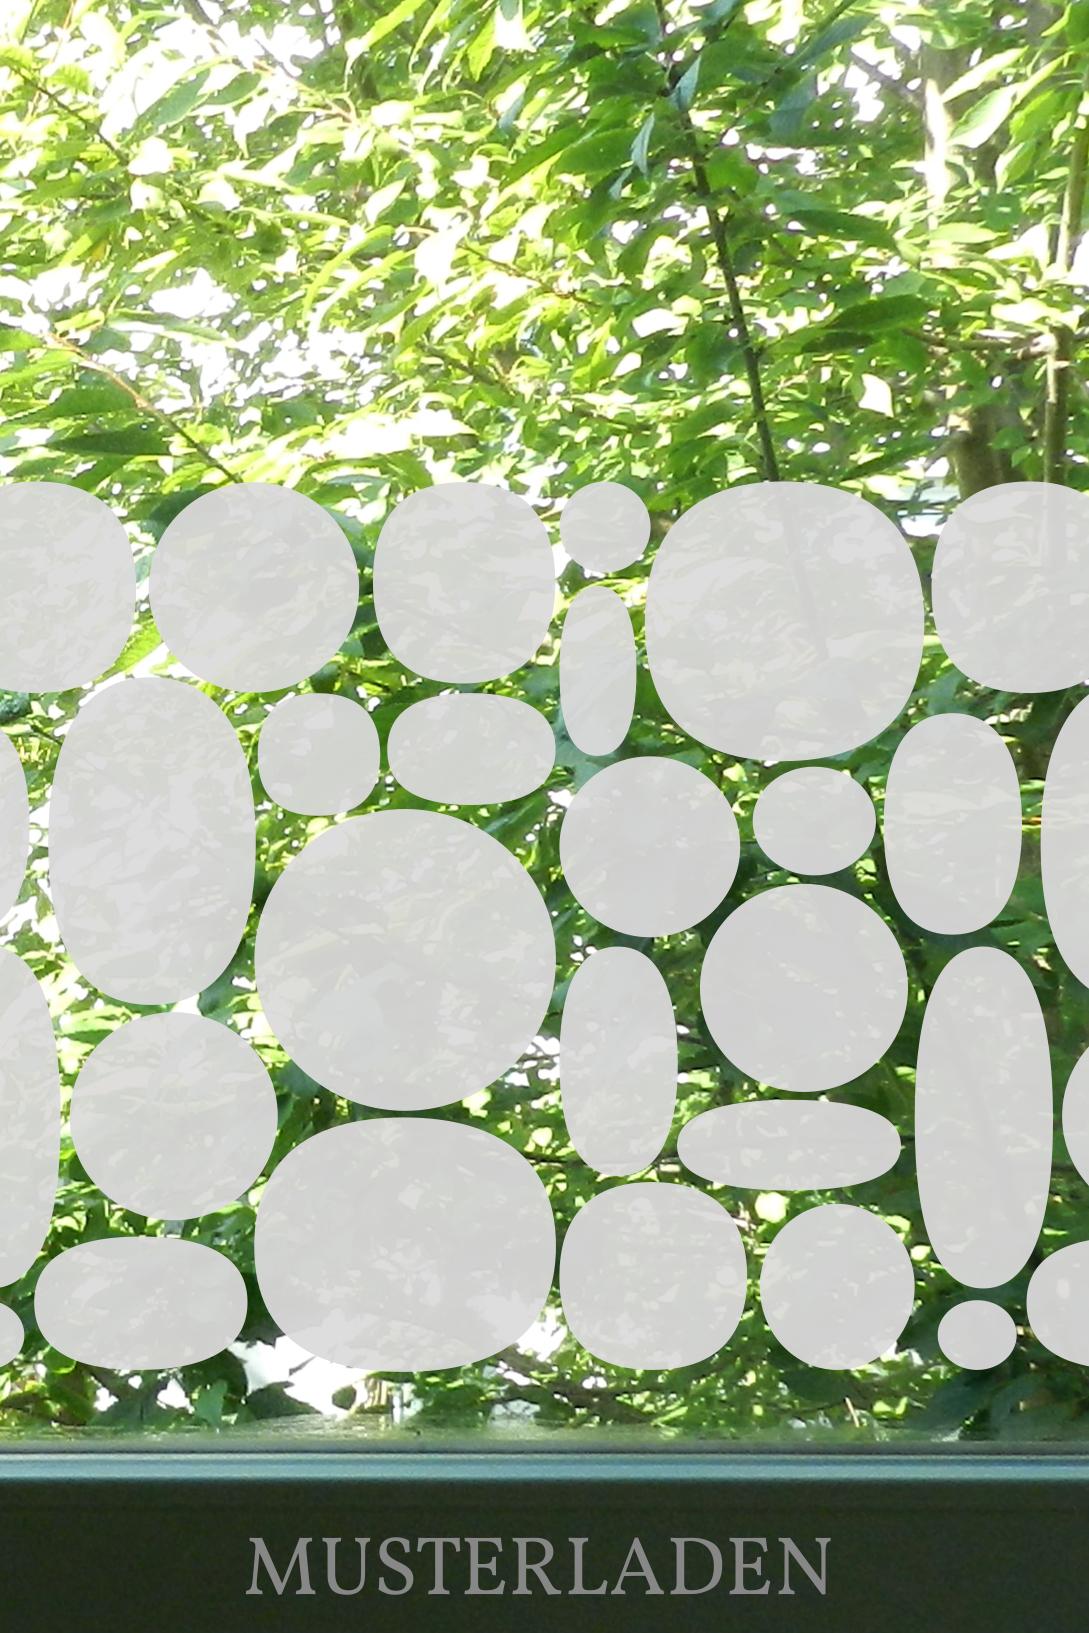 Fensterfolien Motive geometrisch - Musterladen